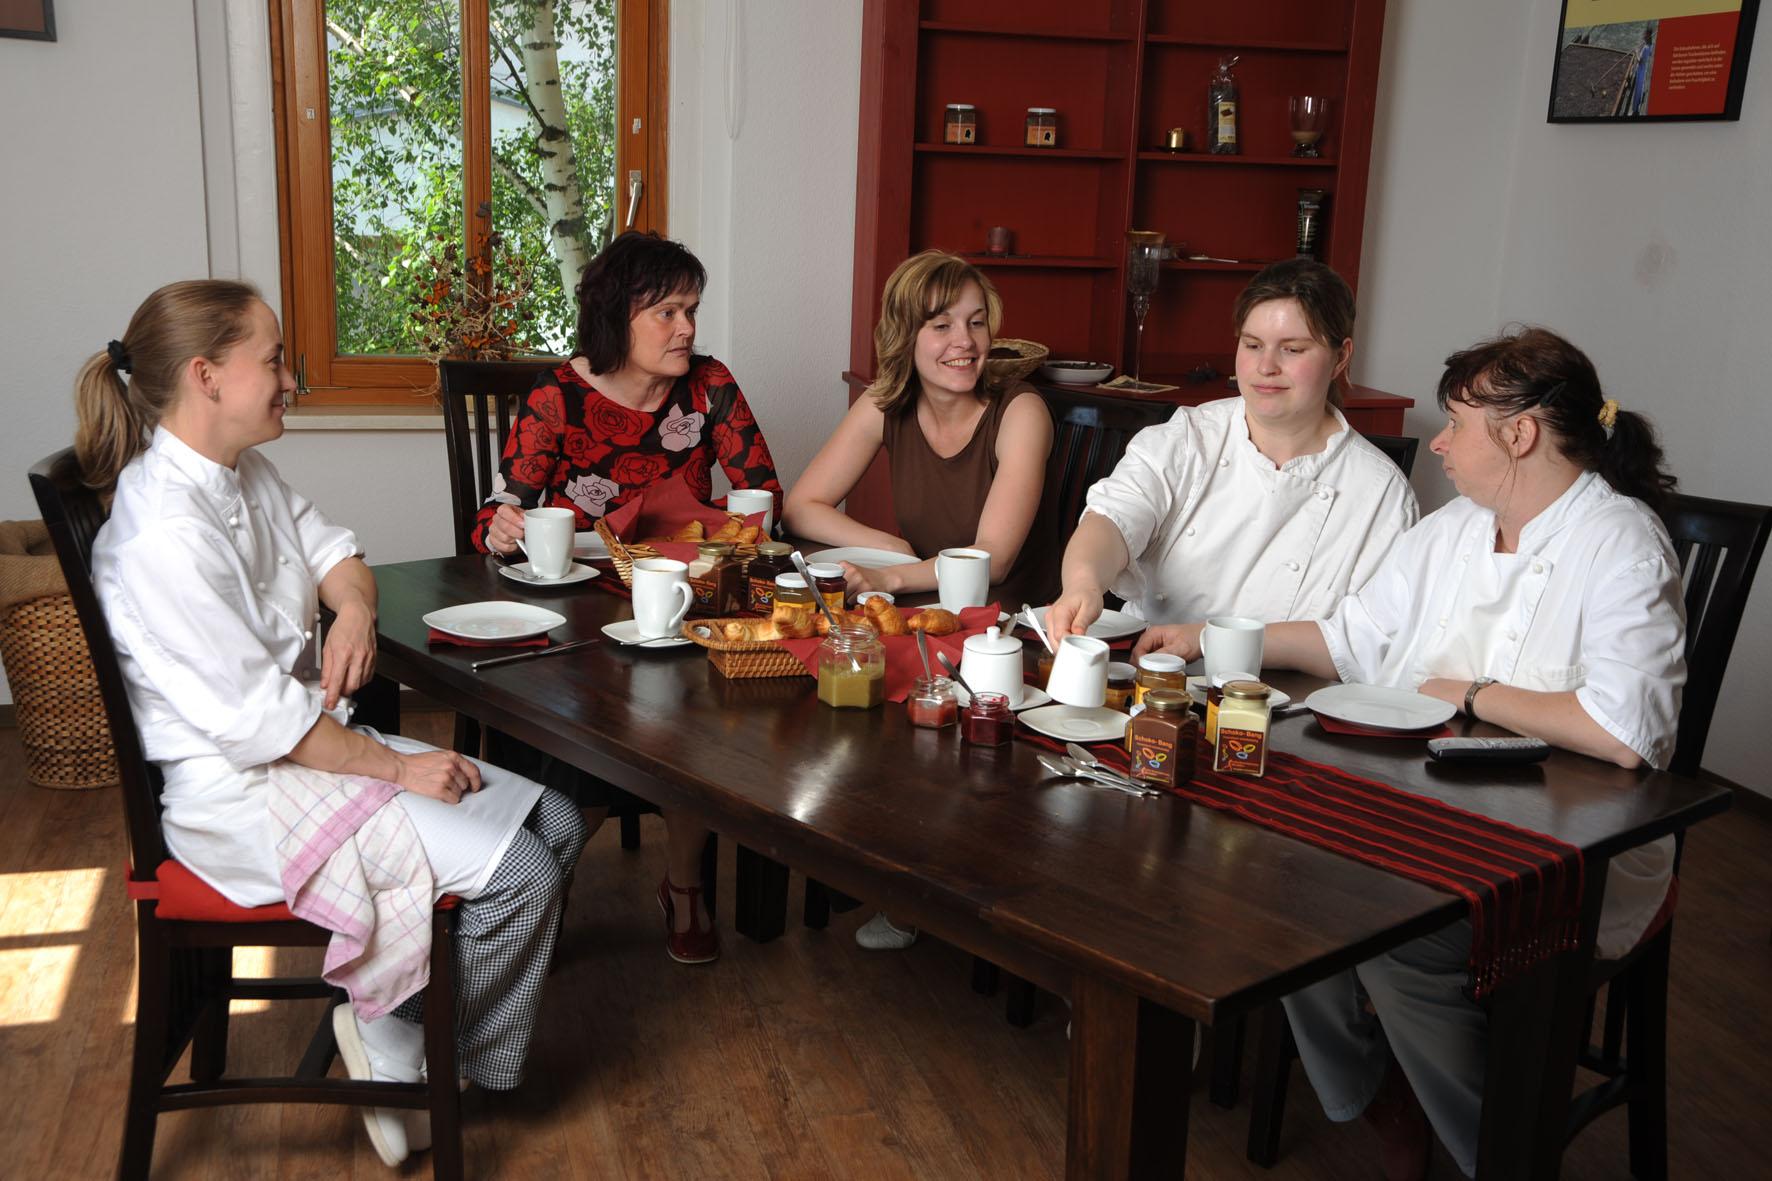 Die Goethe Schokothaler Manufaktur  v.l.: Christiane Kuhwald, Karin Finger (Chefin), Juliane Finger (Tochter) Anke Huehn, Susann Bartl  Bad Frankenhausen   15.05.2008   Foto: Nikola   Text: Hoernle